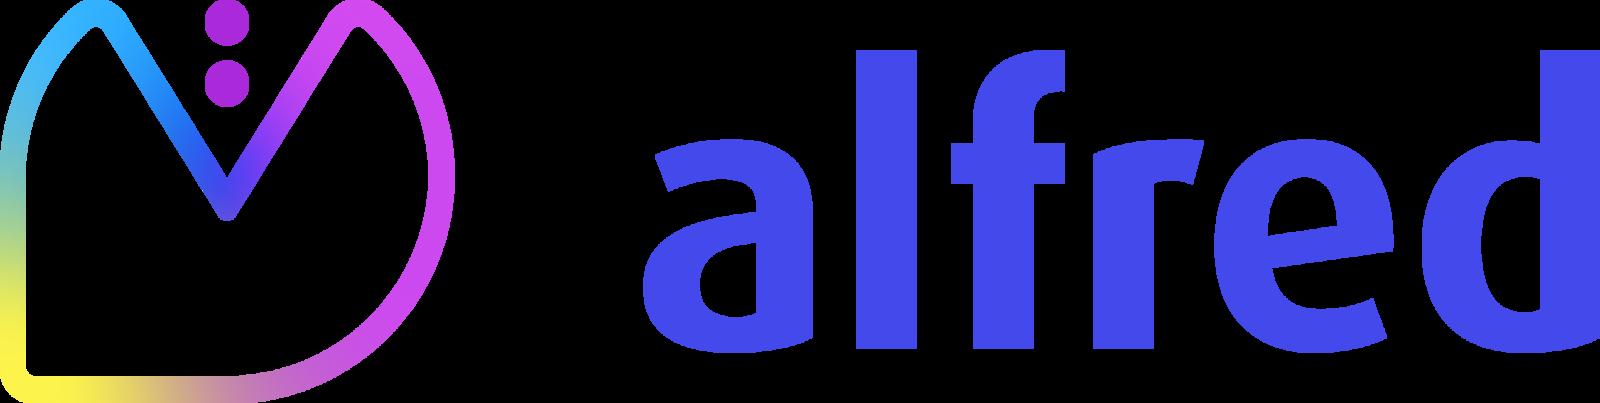 Alfred apps helpdesk